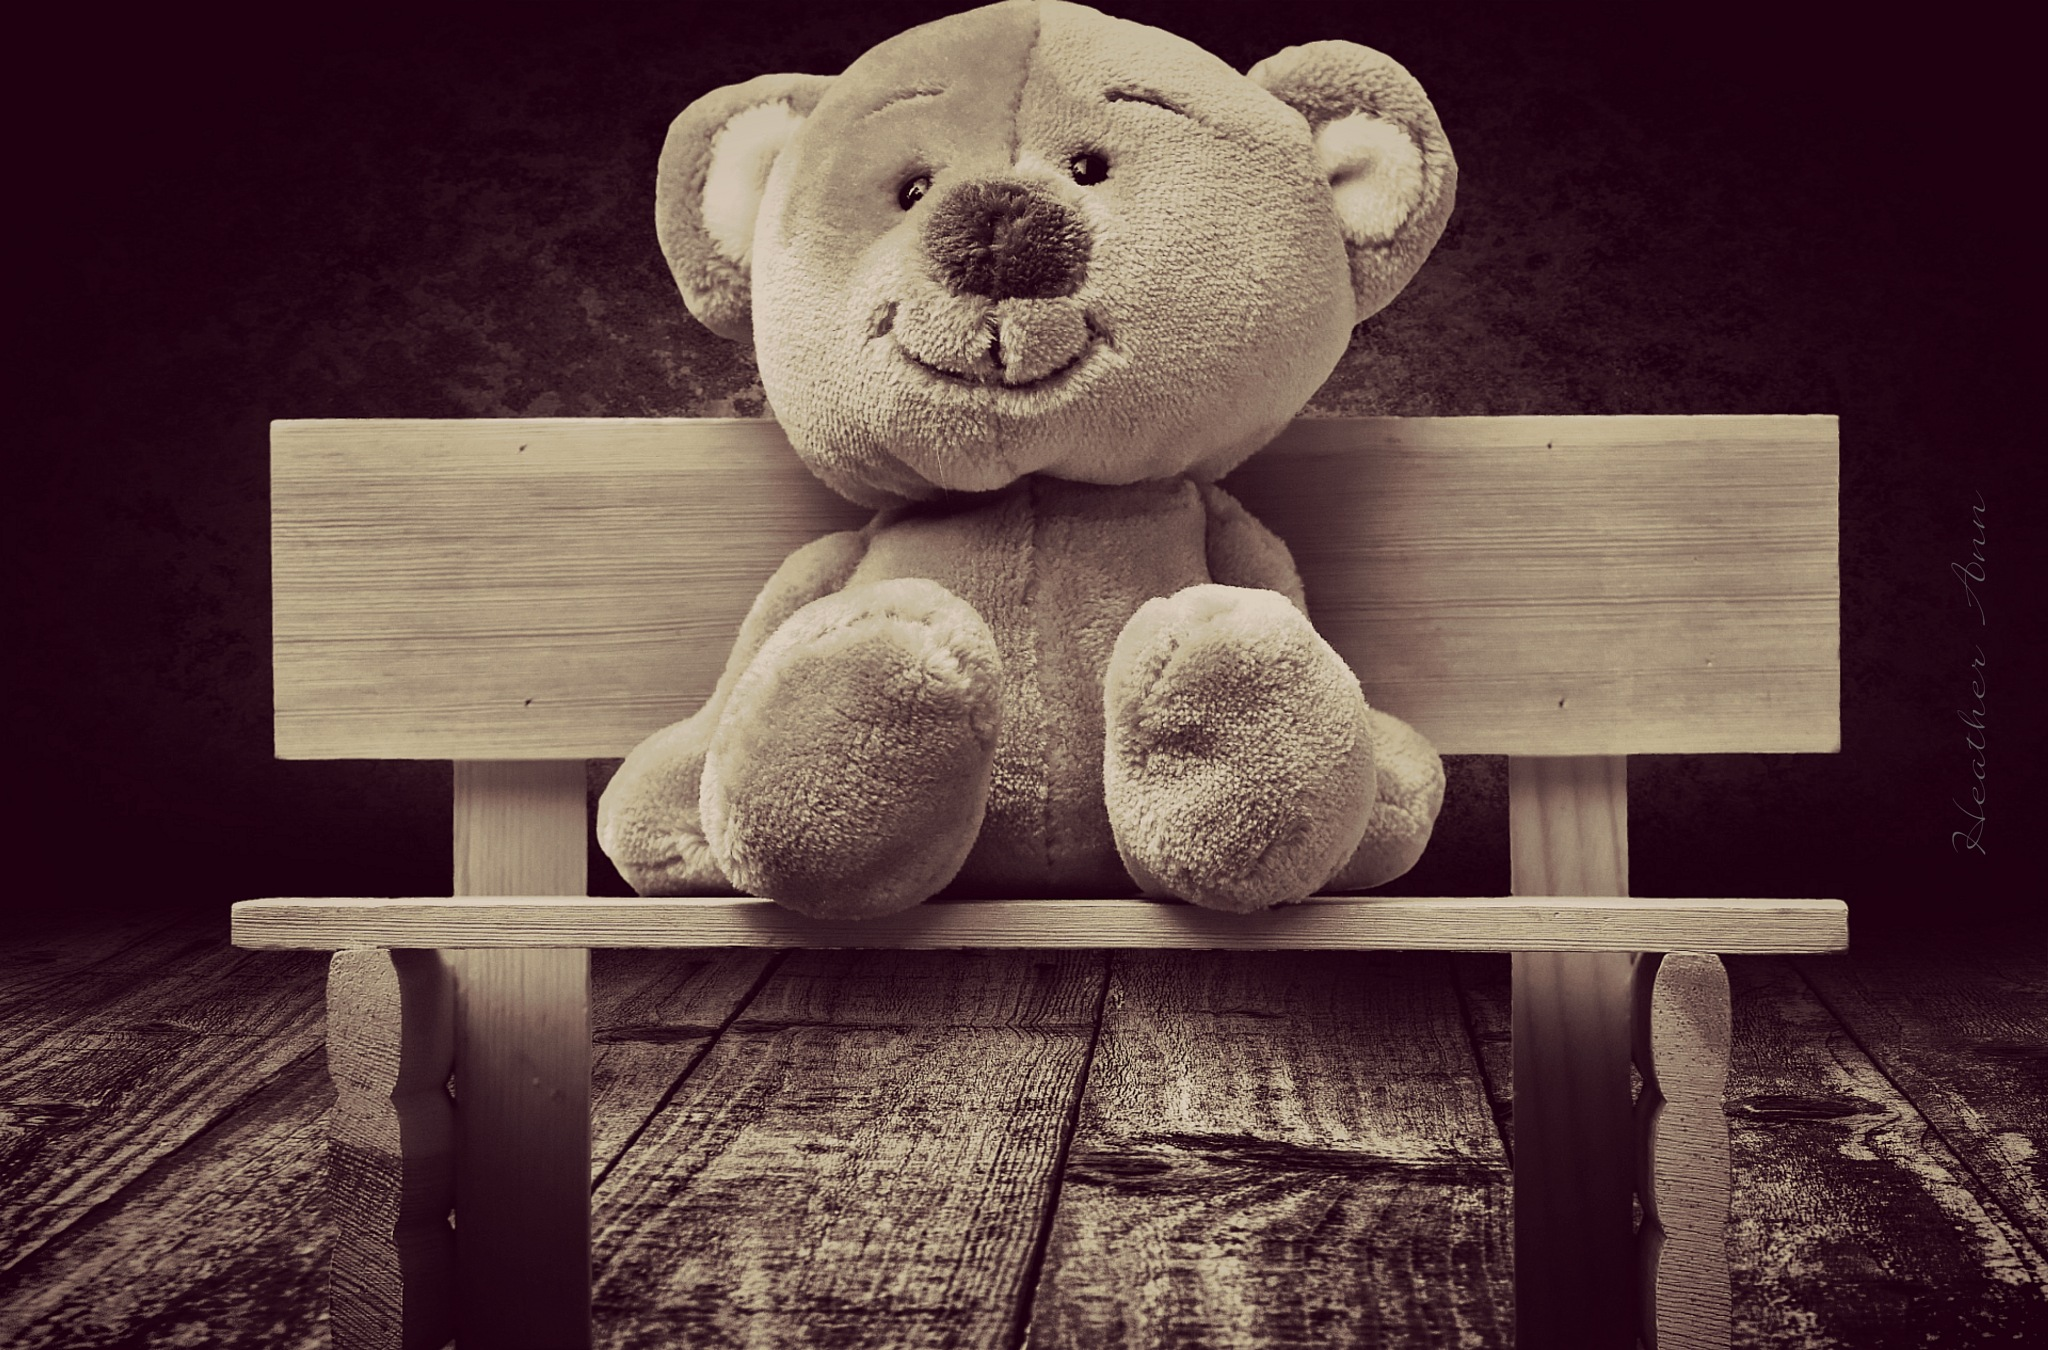 Childish Things by Heather Ann Plew